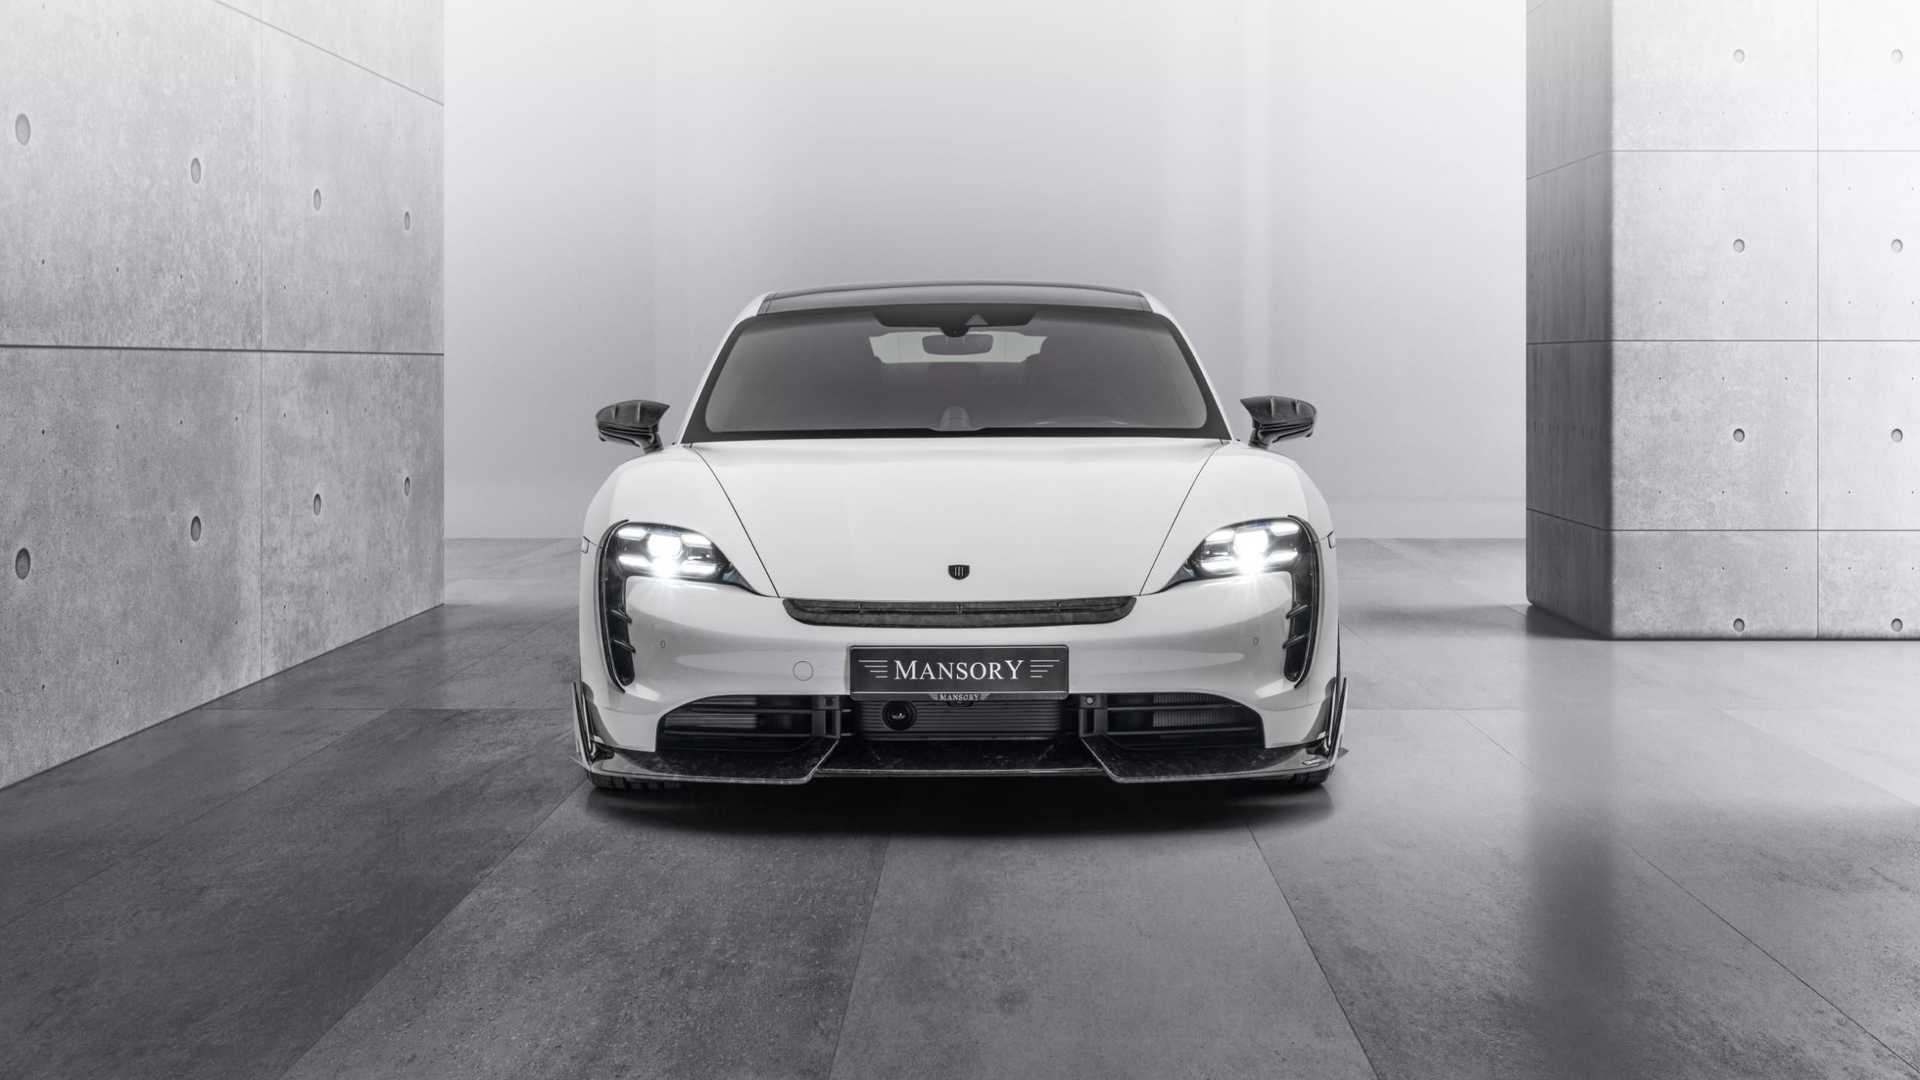 Porsche-Taycan-by-Mansory-4